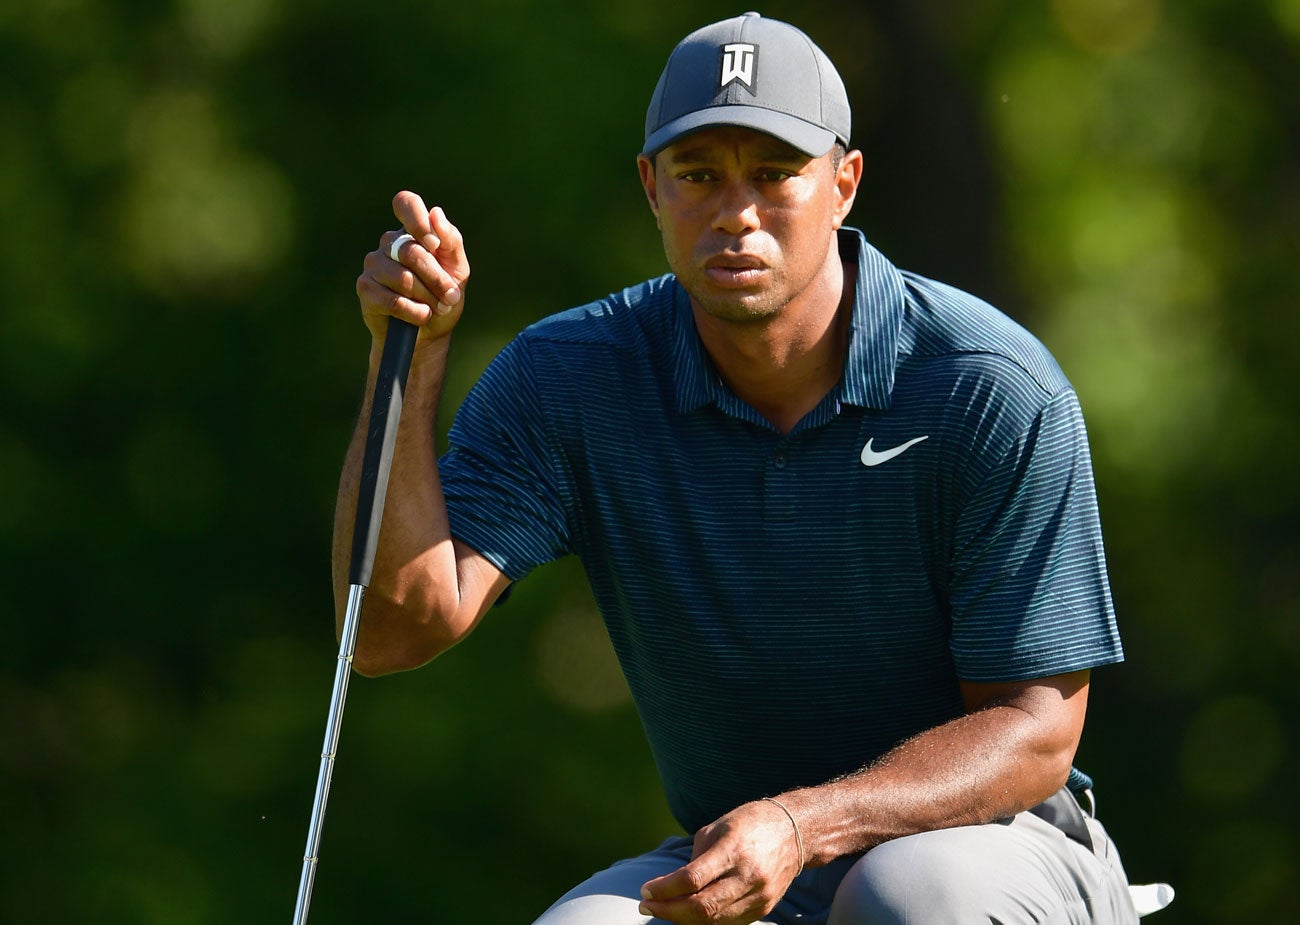 Tiger Woods shirt change, PGA Championship 2018